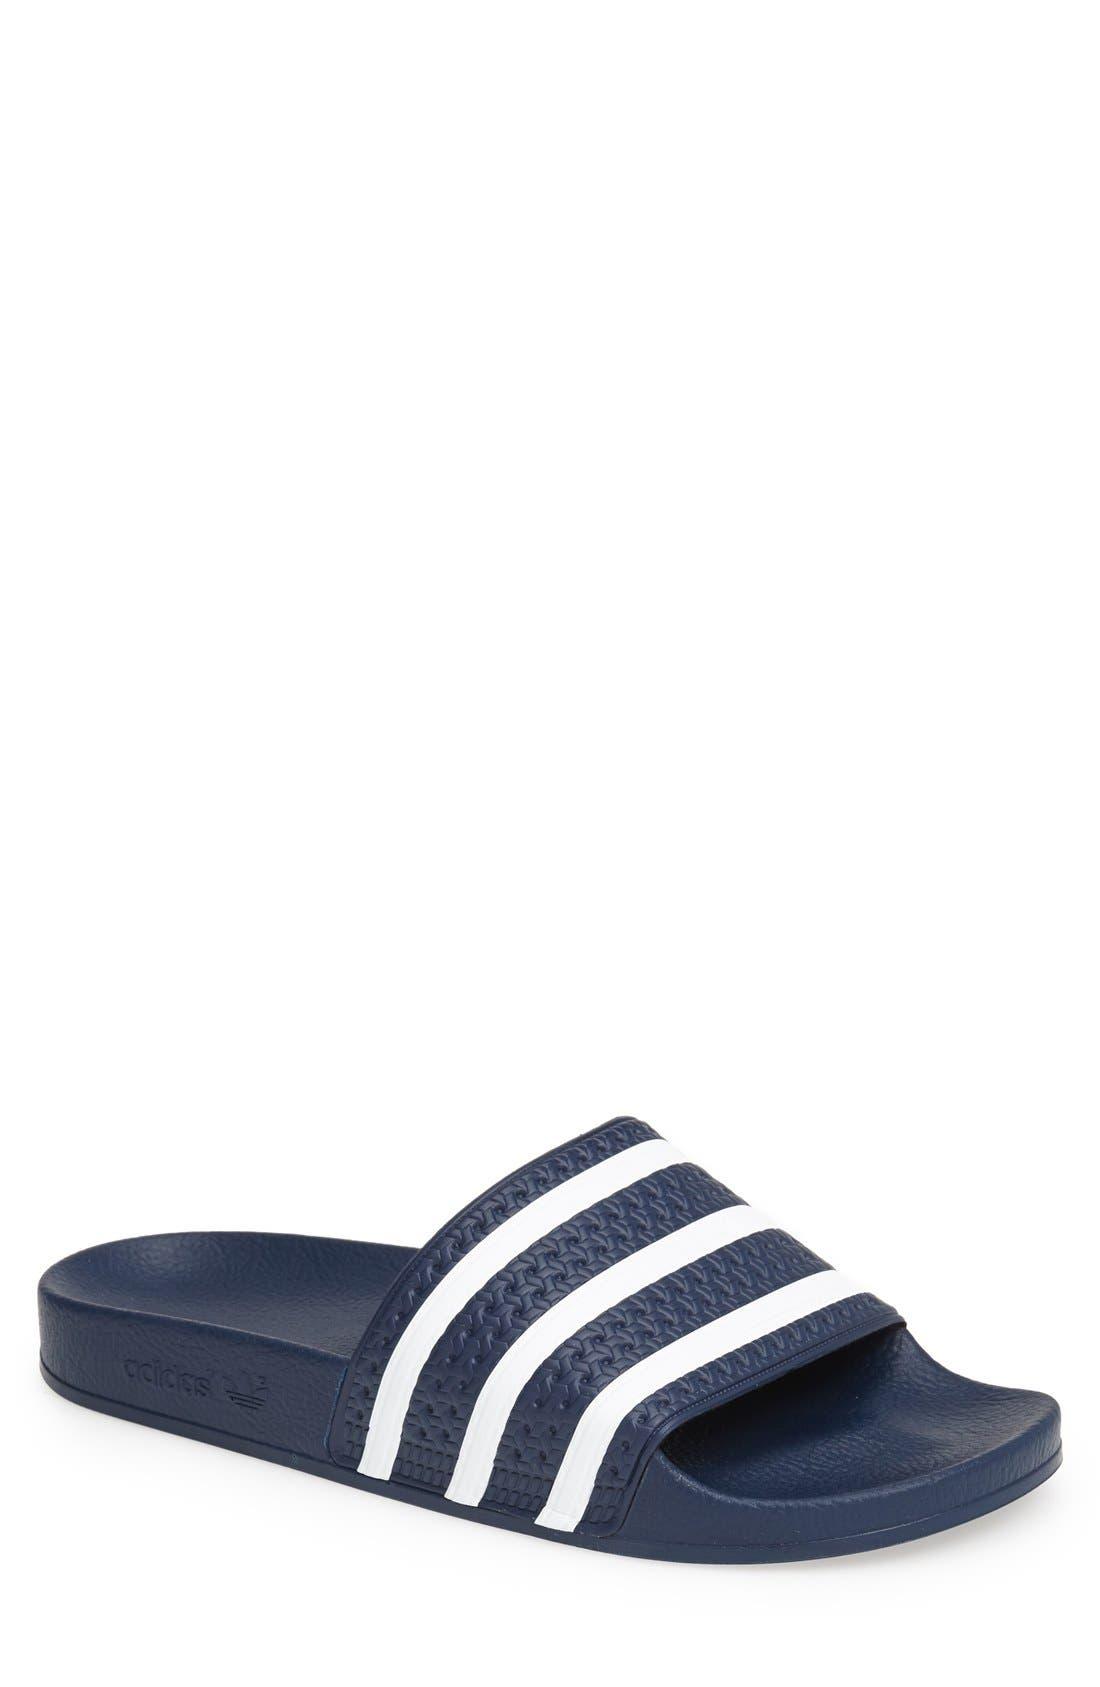 adidas slip on flip flops